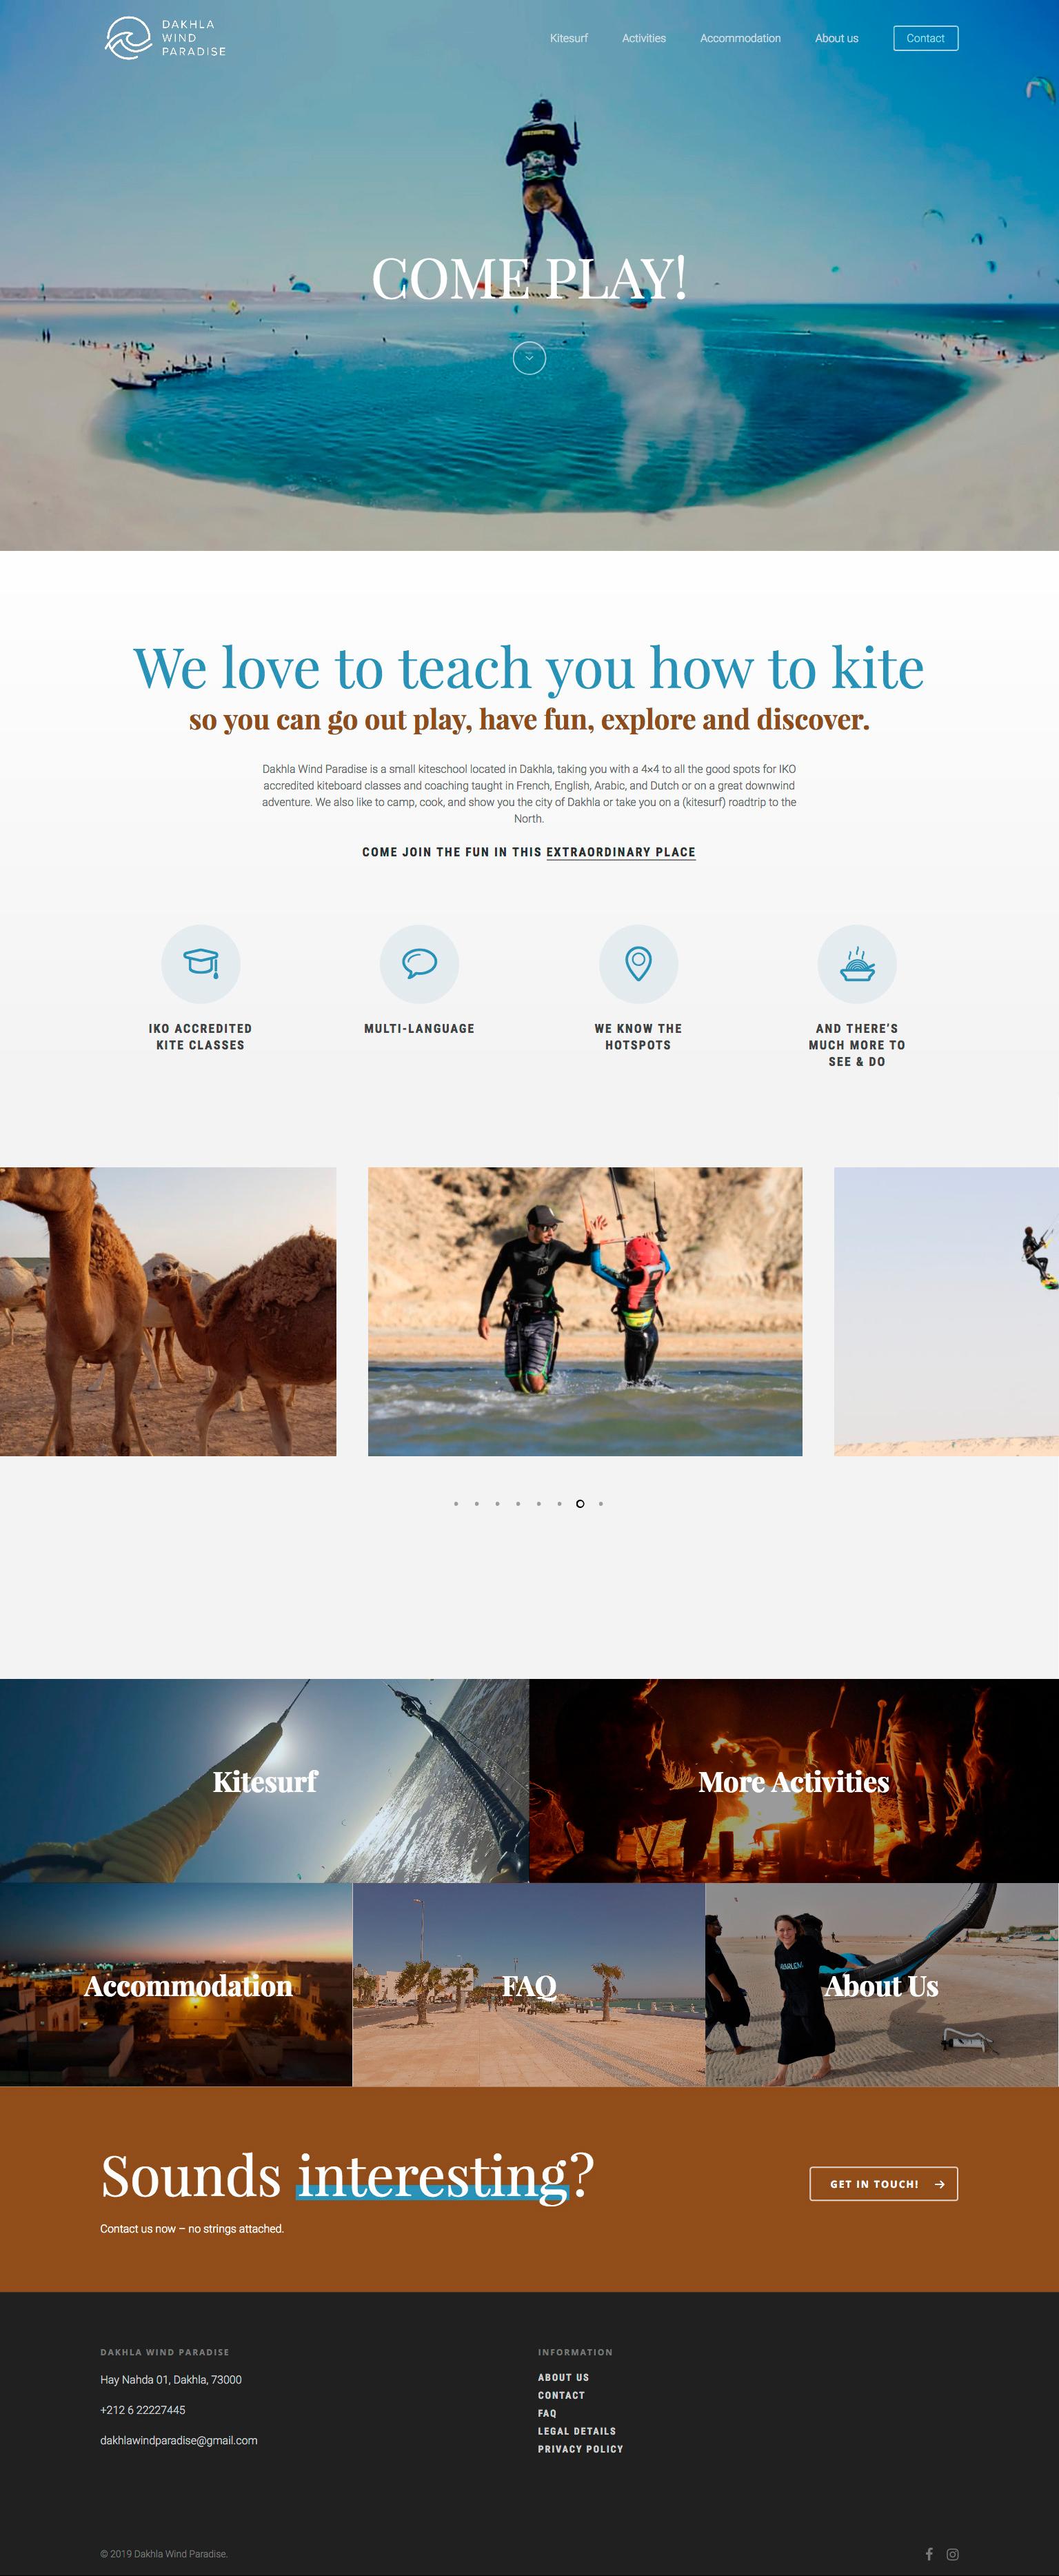 Dakhla Wind Paradise Website designed by Tobias Heumann